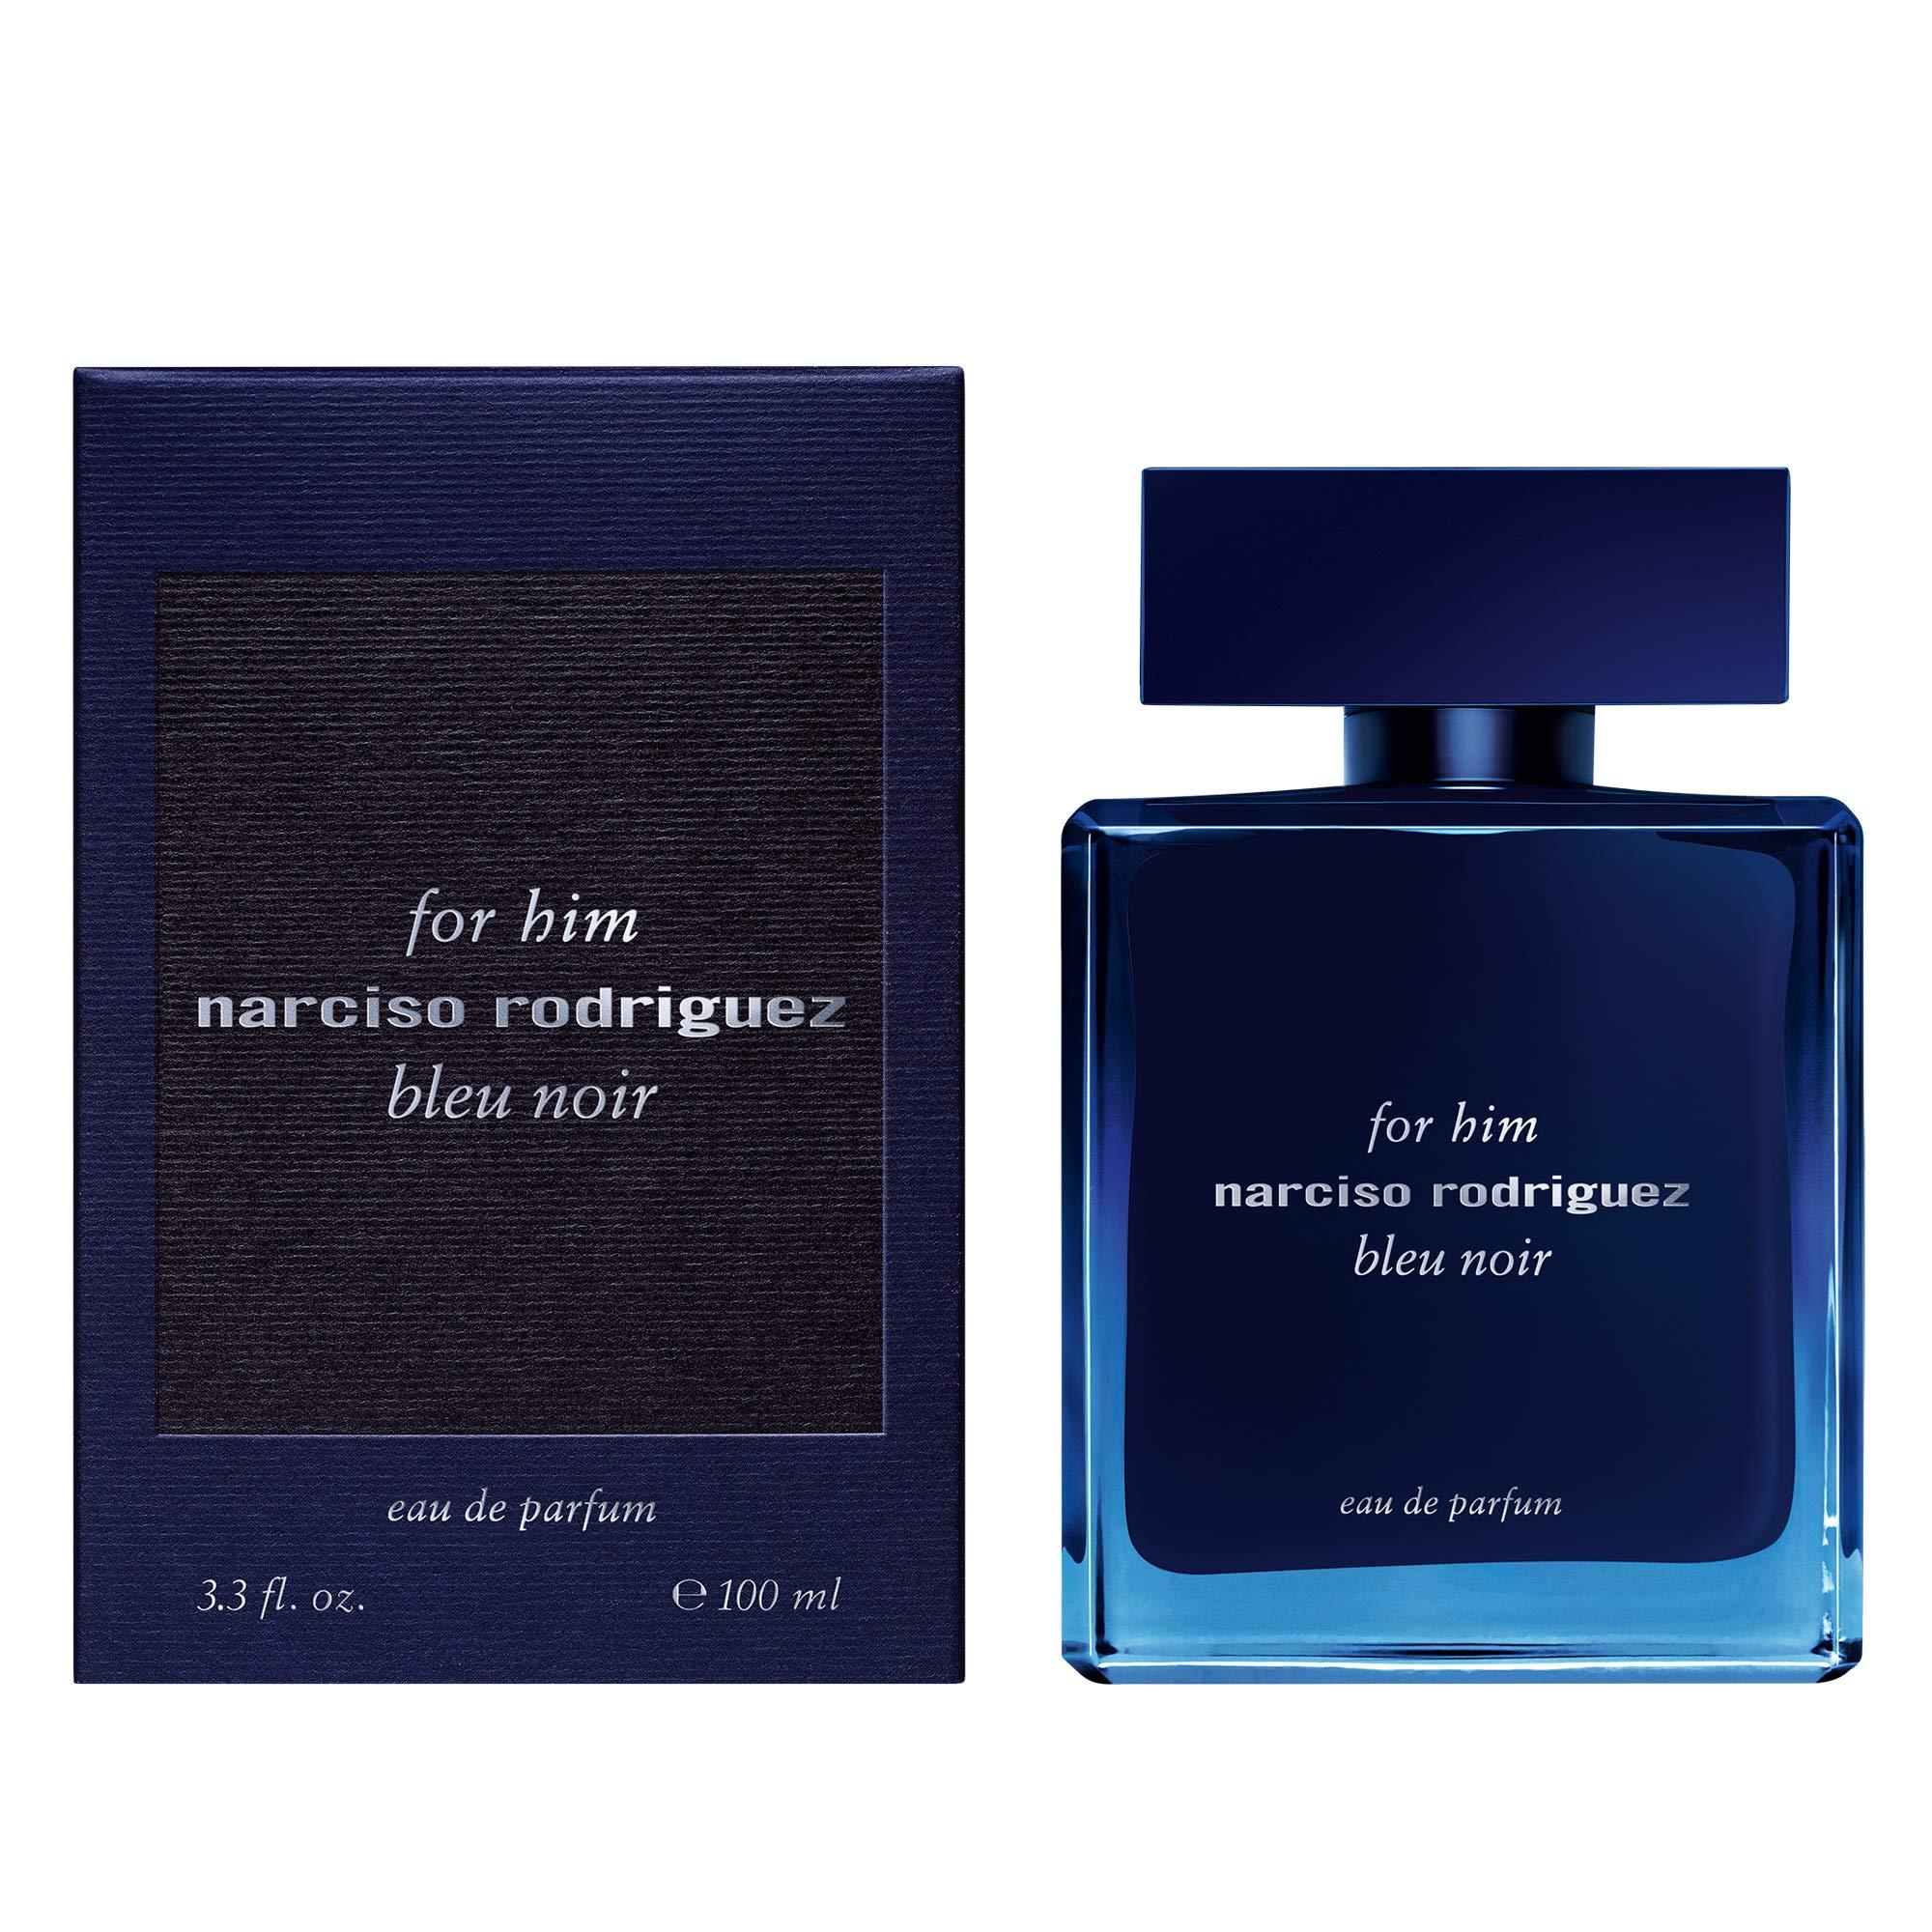 Narciso Rodriguez Bleu Noir Eau de Parfum Spray for Men, 3.3 Ounce